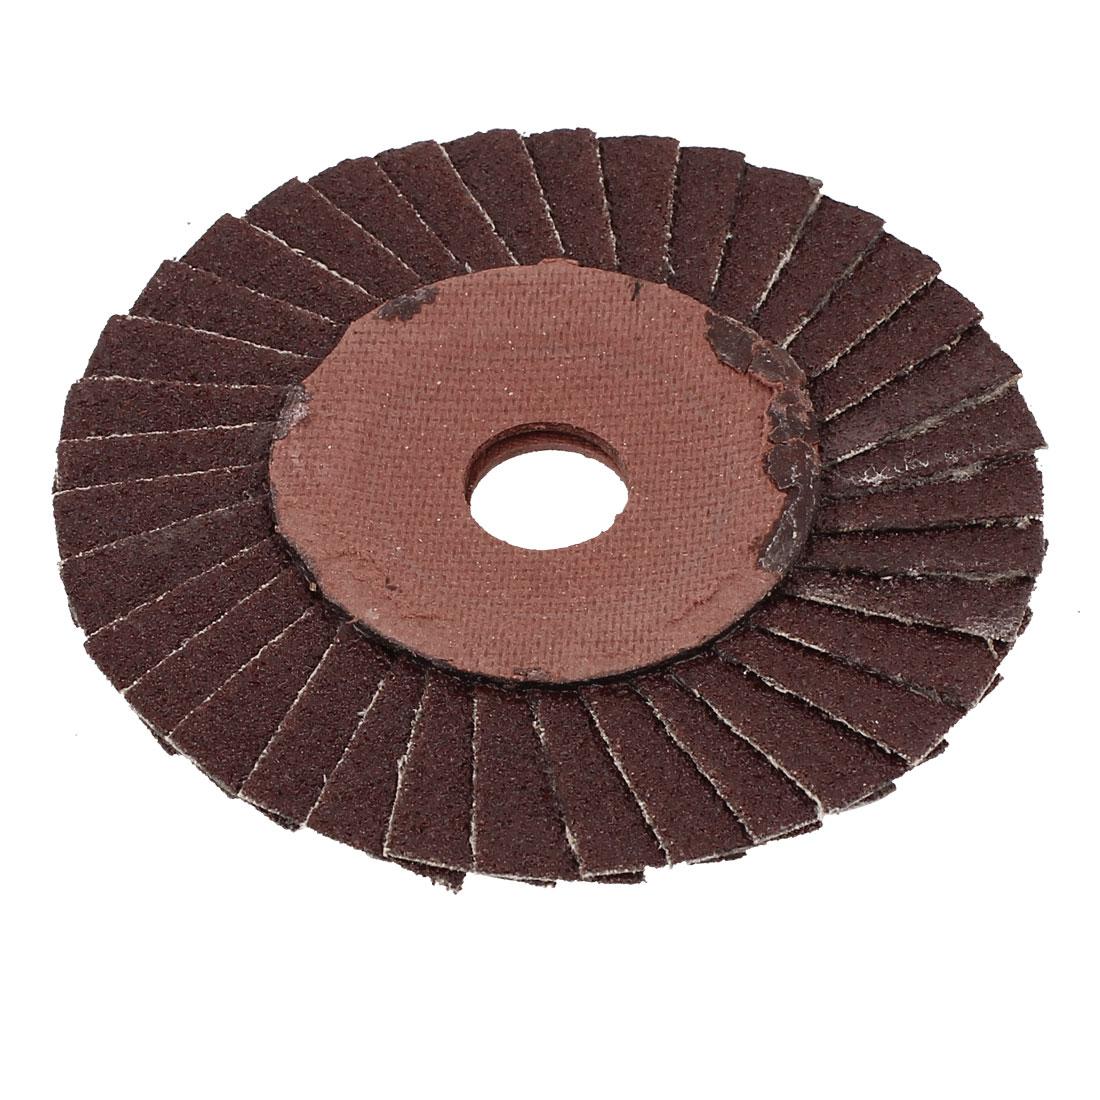 100mmx16mmx3mm 36 Grit Abrasive Flap Sanding Grinding Disc Polishing Wheel